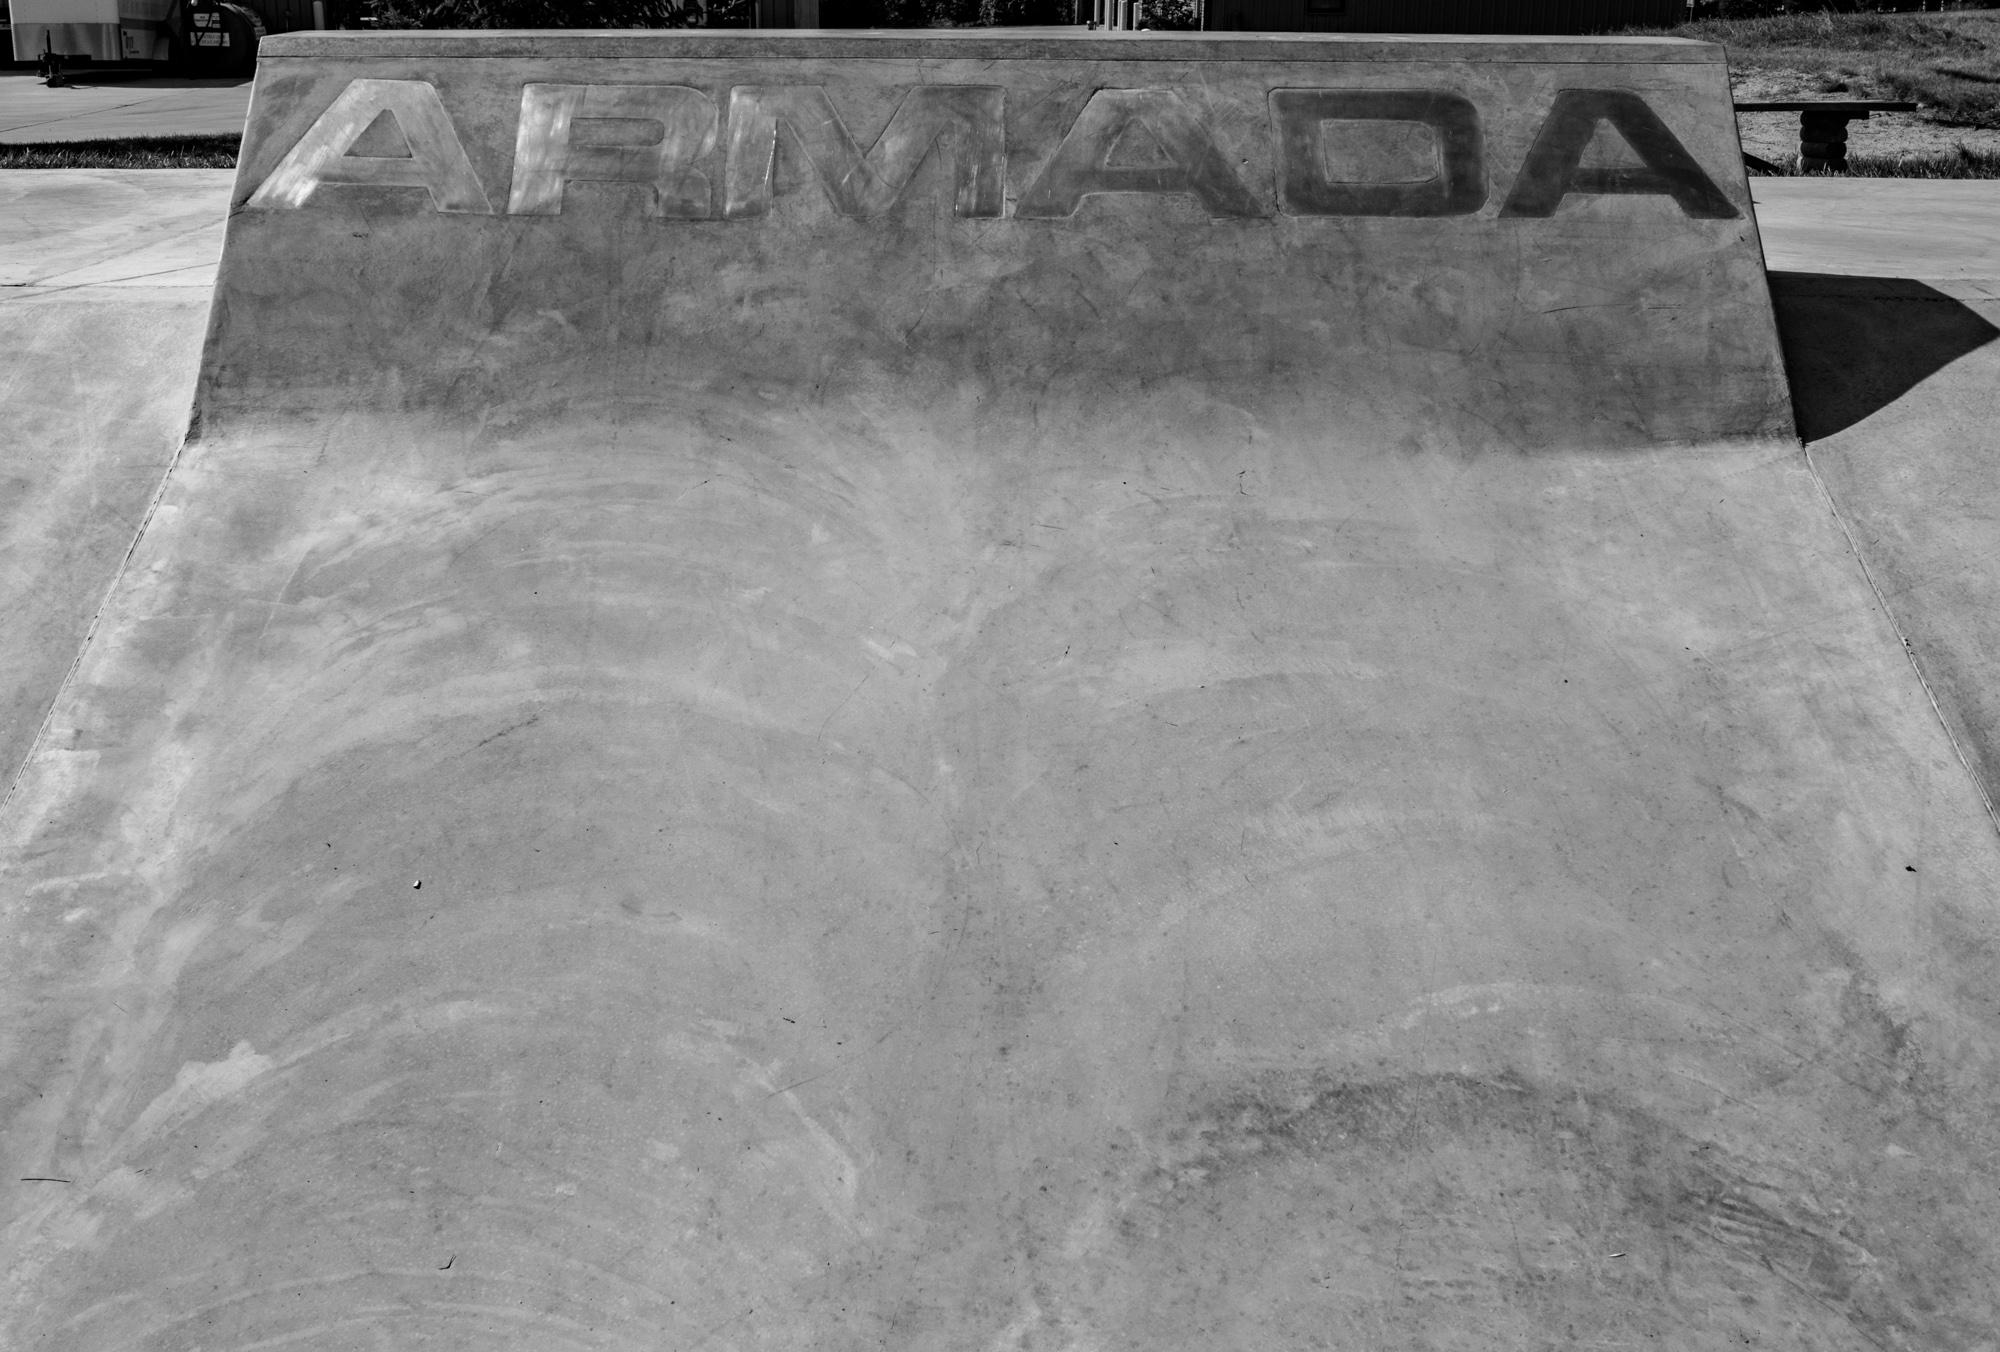 Armada Board and Skatepark-02860